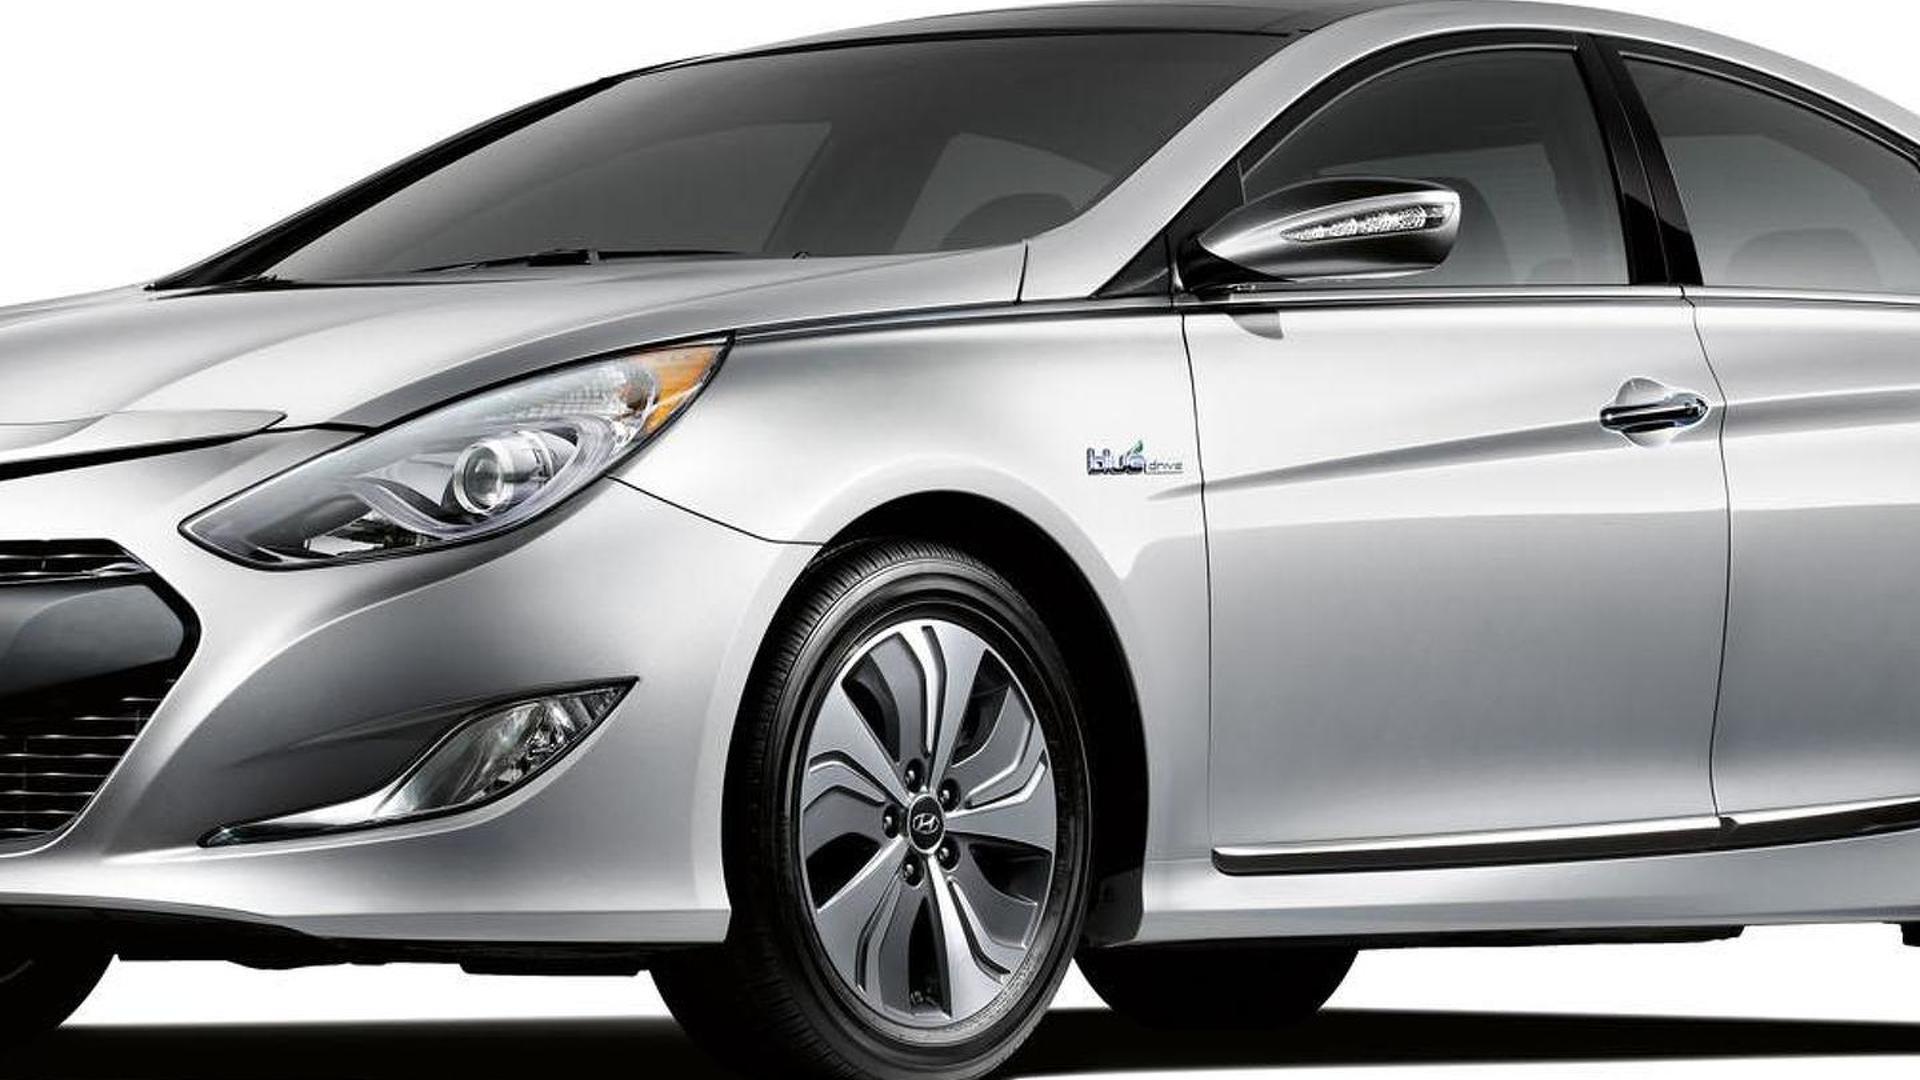 2013 Hyundai Sonata Hybrid unveiled with upgraded powertrain